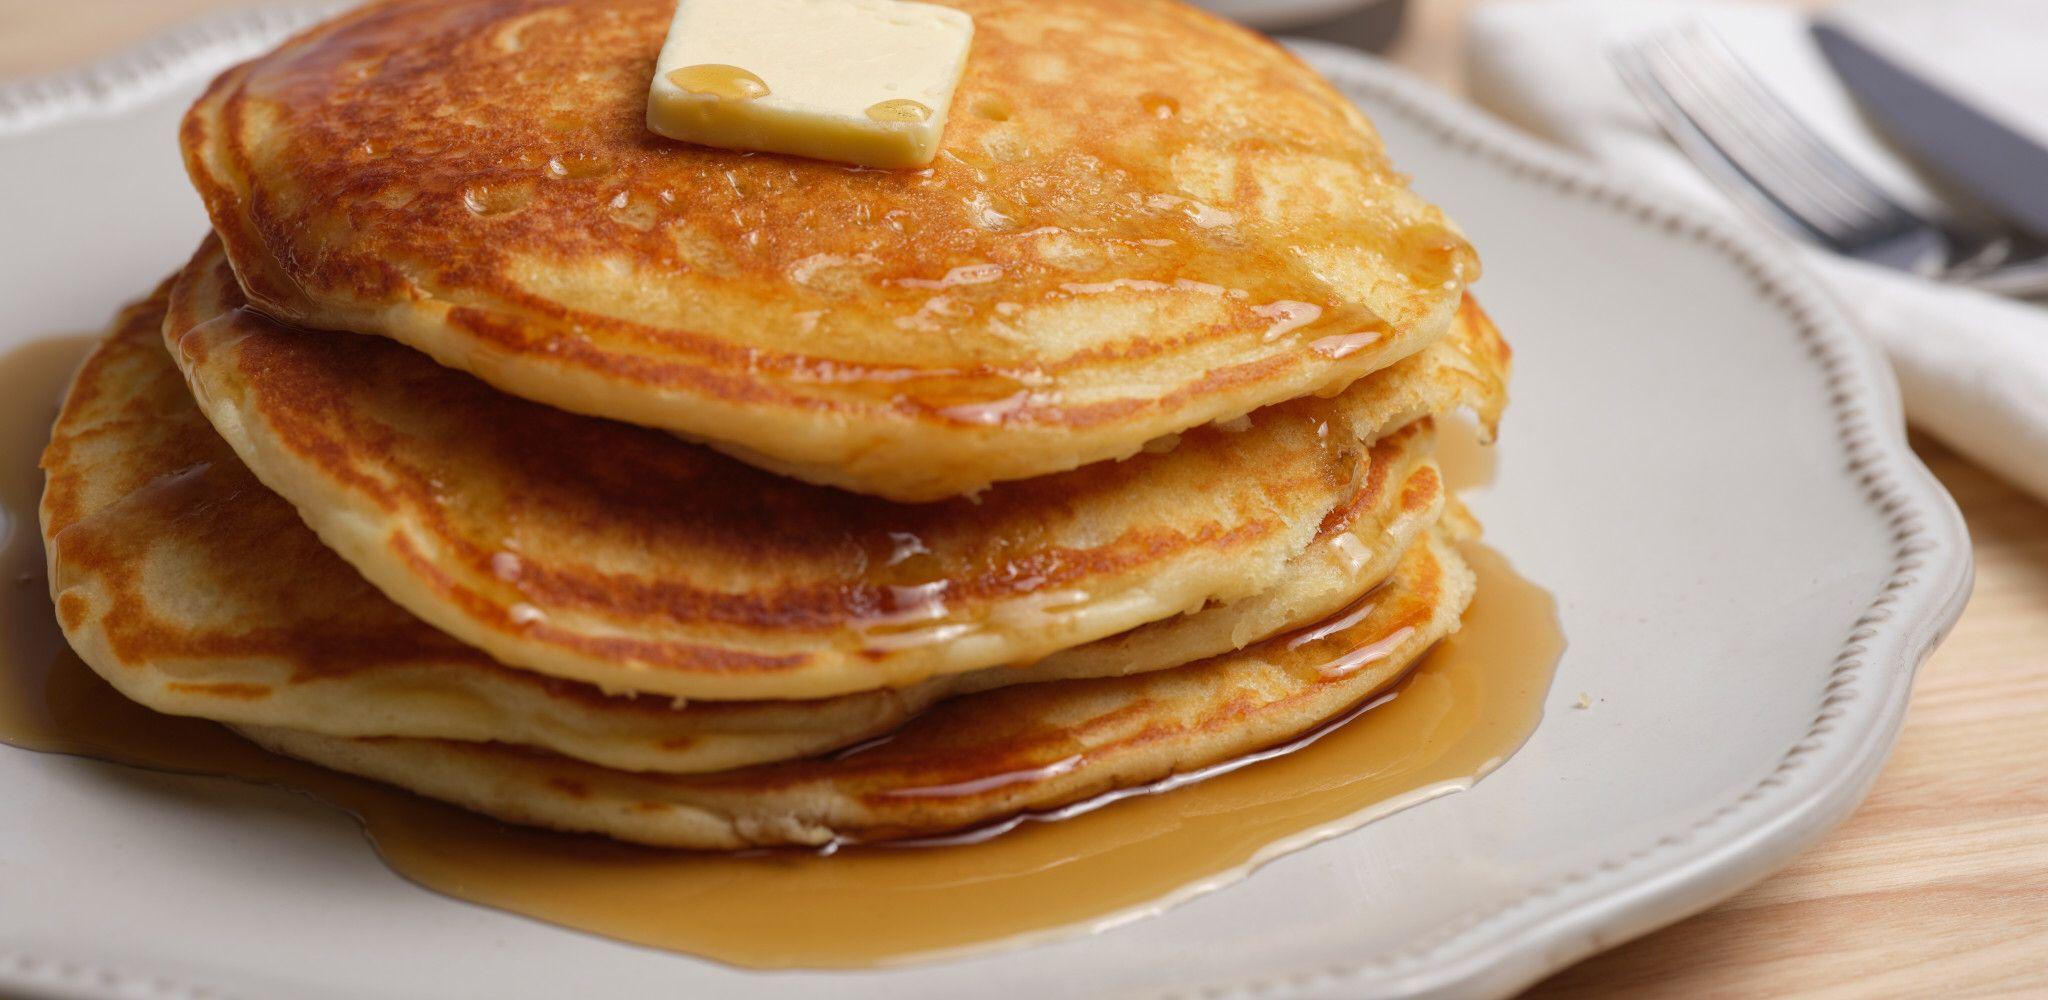 The Best Buttermilk Pancakes Recipe In 2020 Food Network Recipes Food Network Pancakes Buttermilk Pancakes